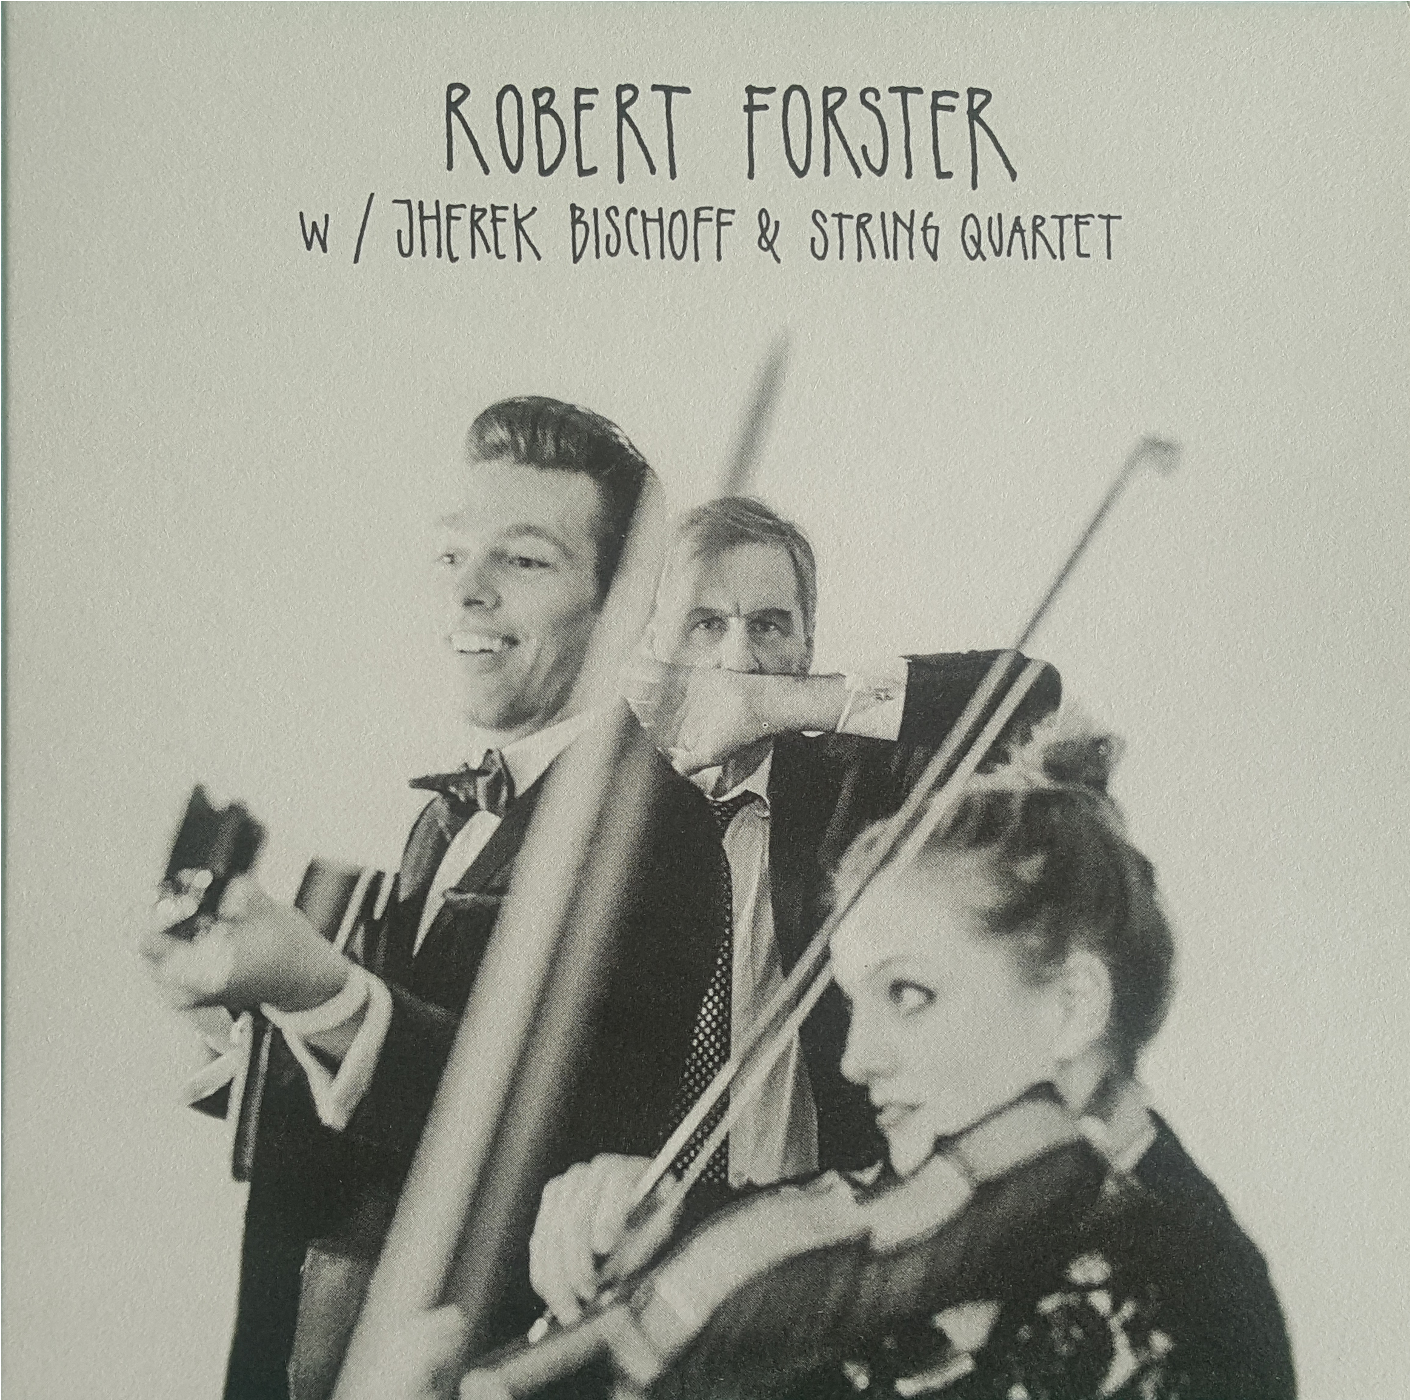 RobertForsterFront1400px.png